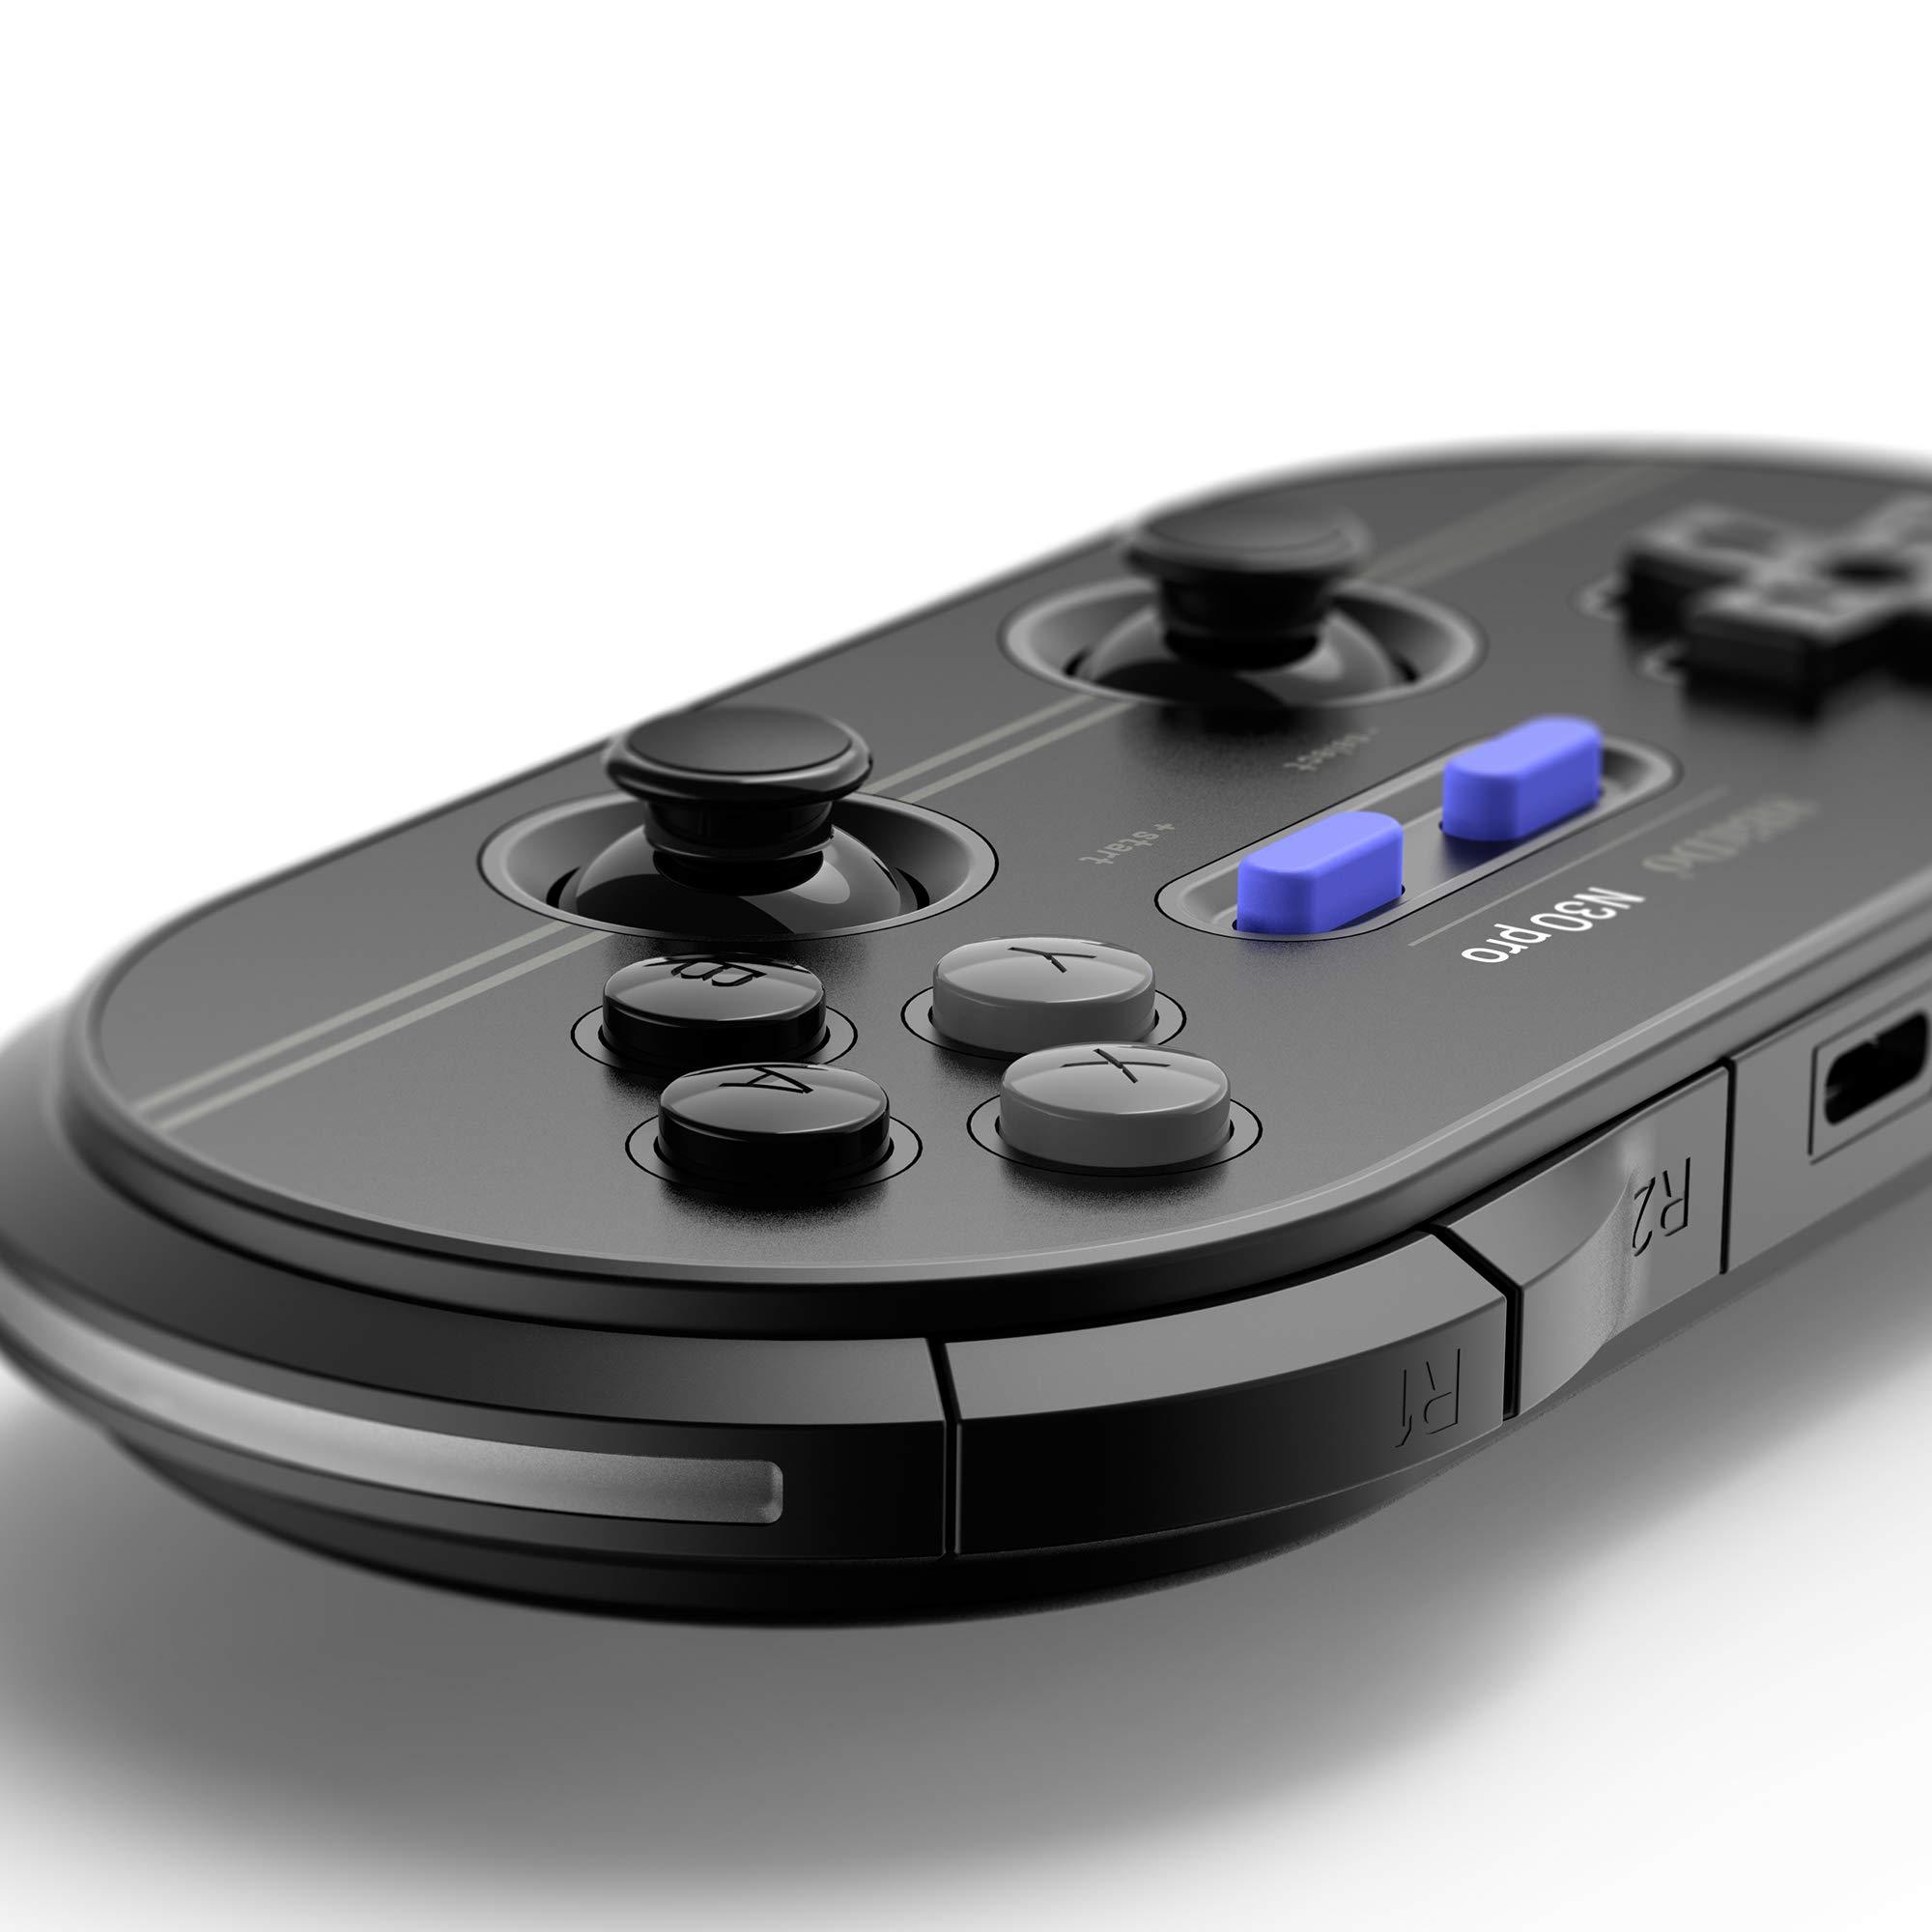 8Bitdo N30 Pro 2 (M Edition) Wireless Controller Dual Classic Bluetooth Video Game Joystick